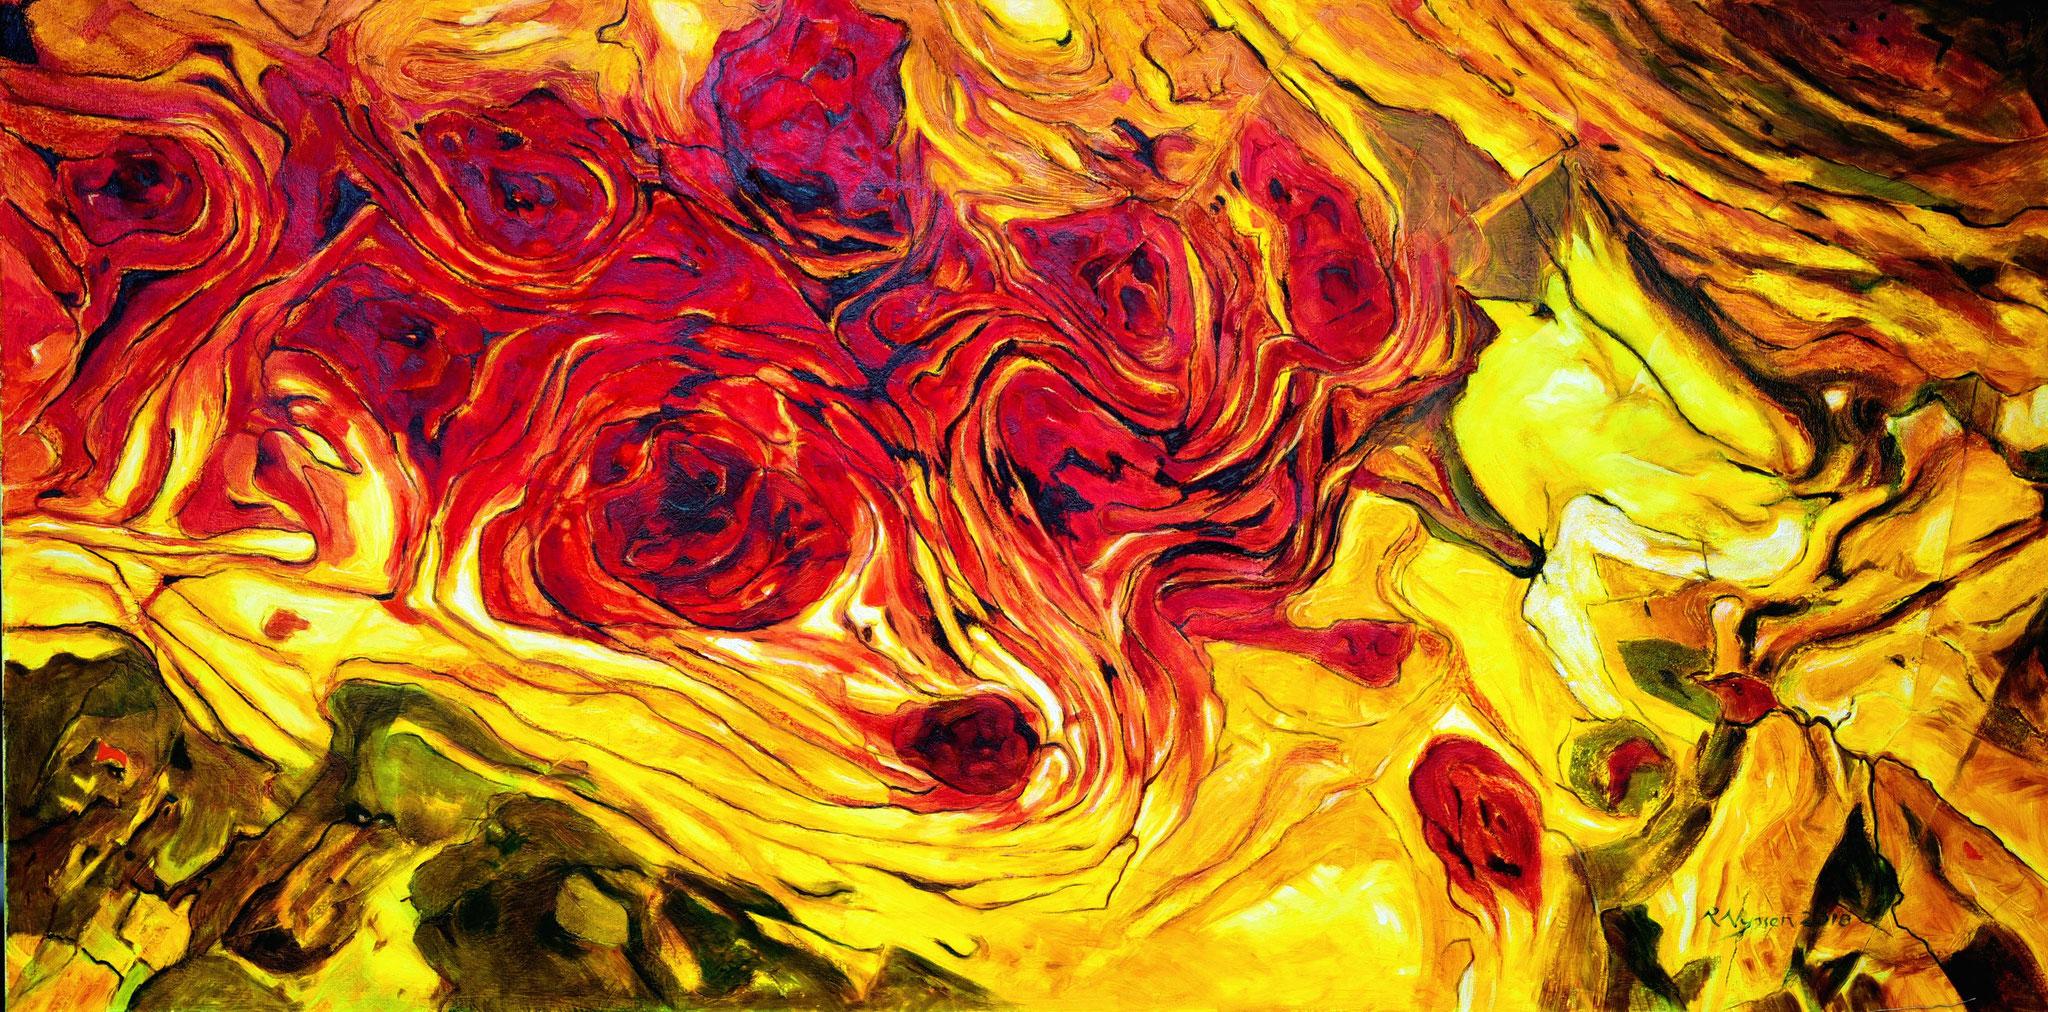 """Blutengel""-2018-Öl auf LW-80*160cm / Blood angel-oil on canvas"